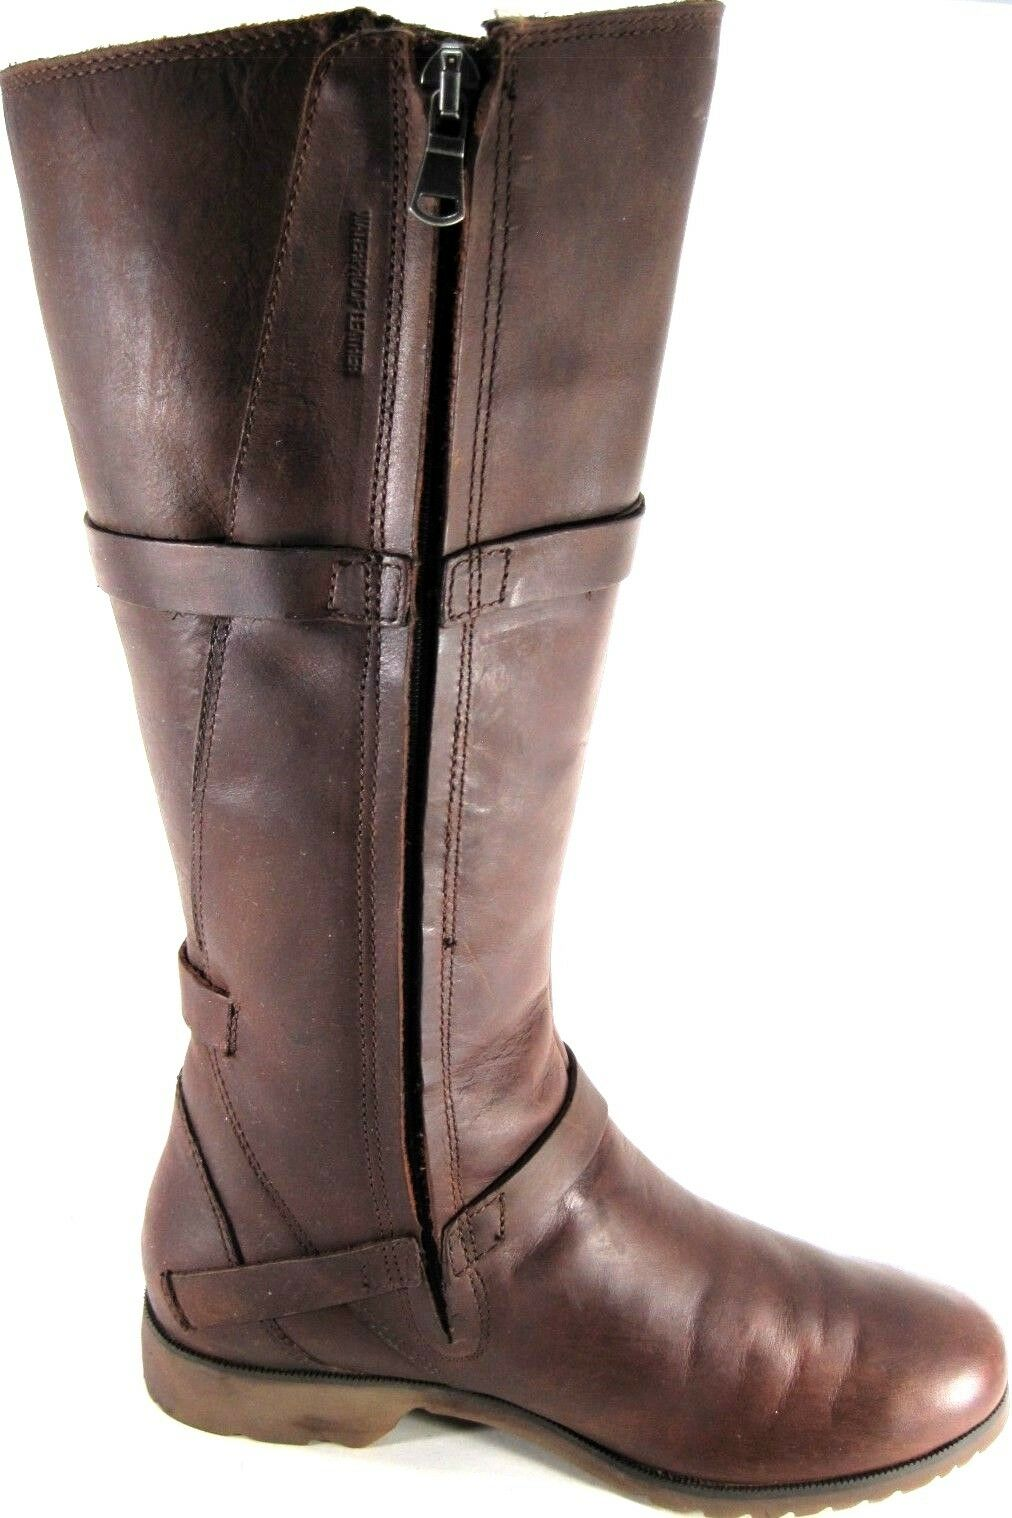 Teva 6 Damens Equestrian Riding Hunting Fashion Stiefel Größe 6 Teva Euro 37 Braun. 92b2fd